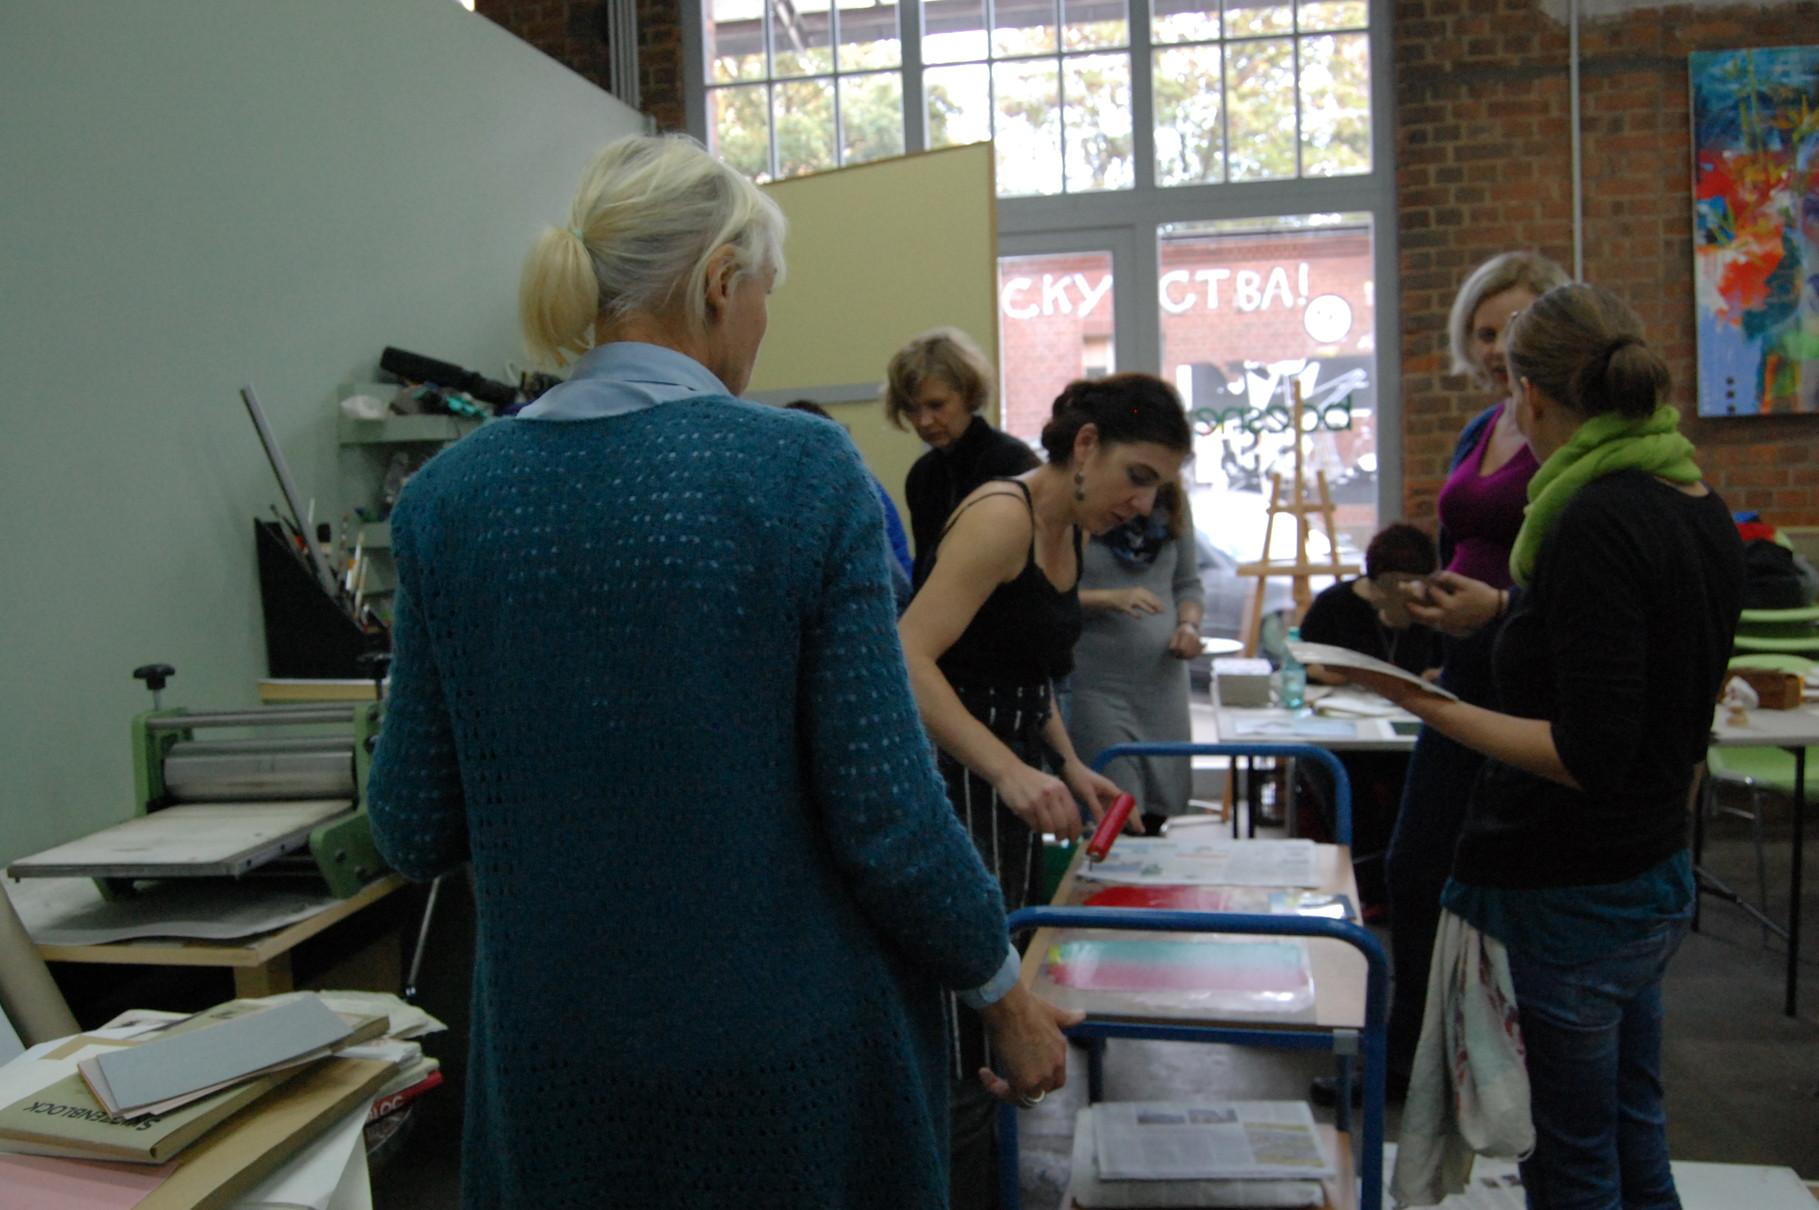 Megi Balzer, Linoldruck Workshop, Boesner Leipzig